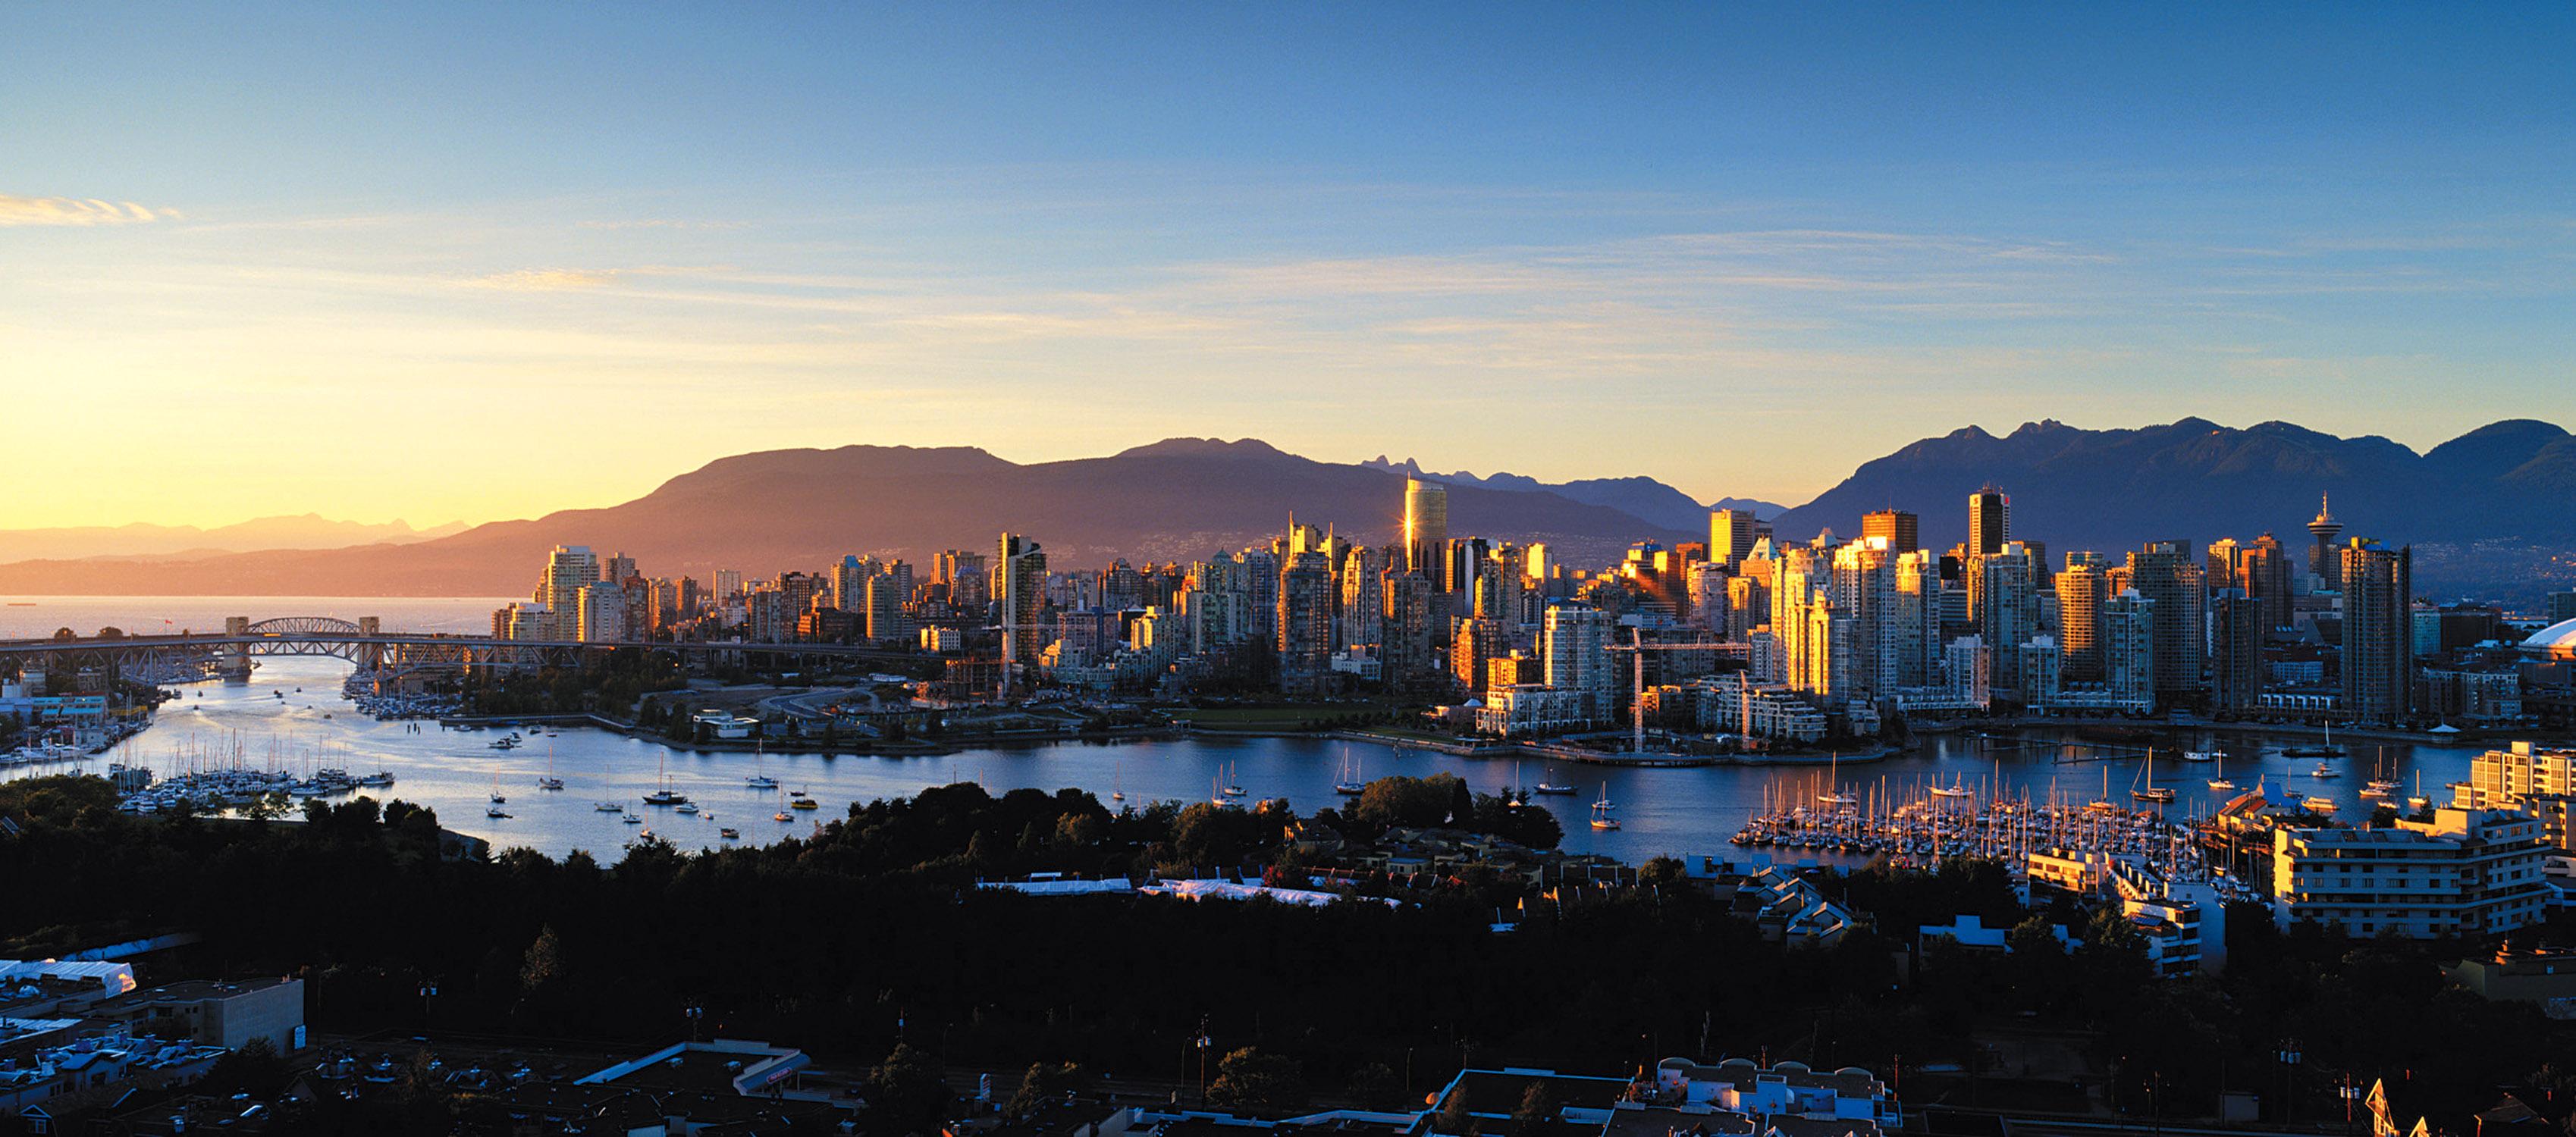 Vancouver Wallpaper 3   3397 X 1500 stmednet 3397x1500